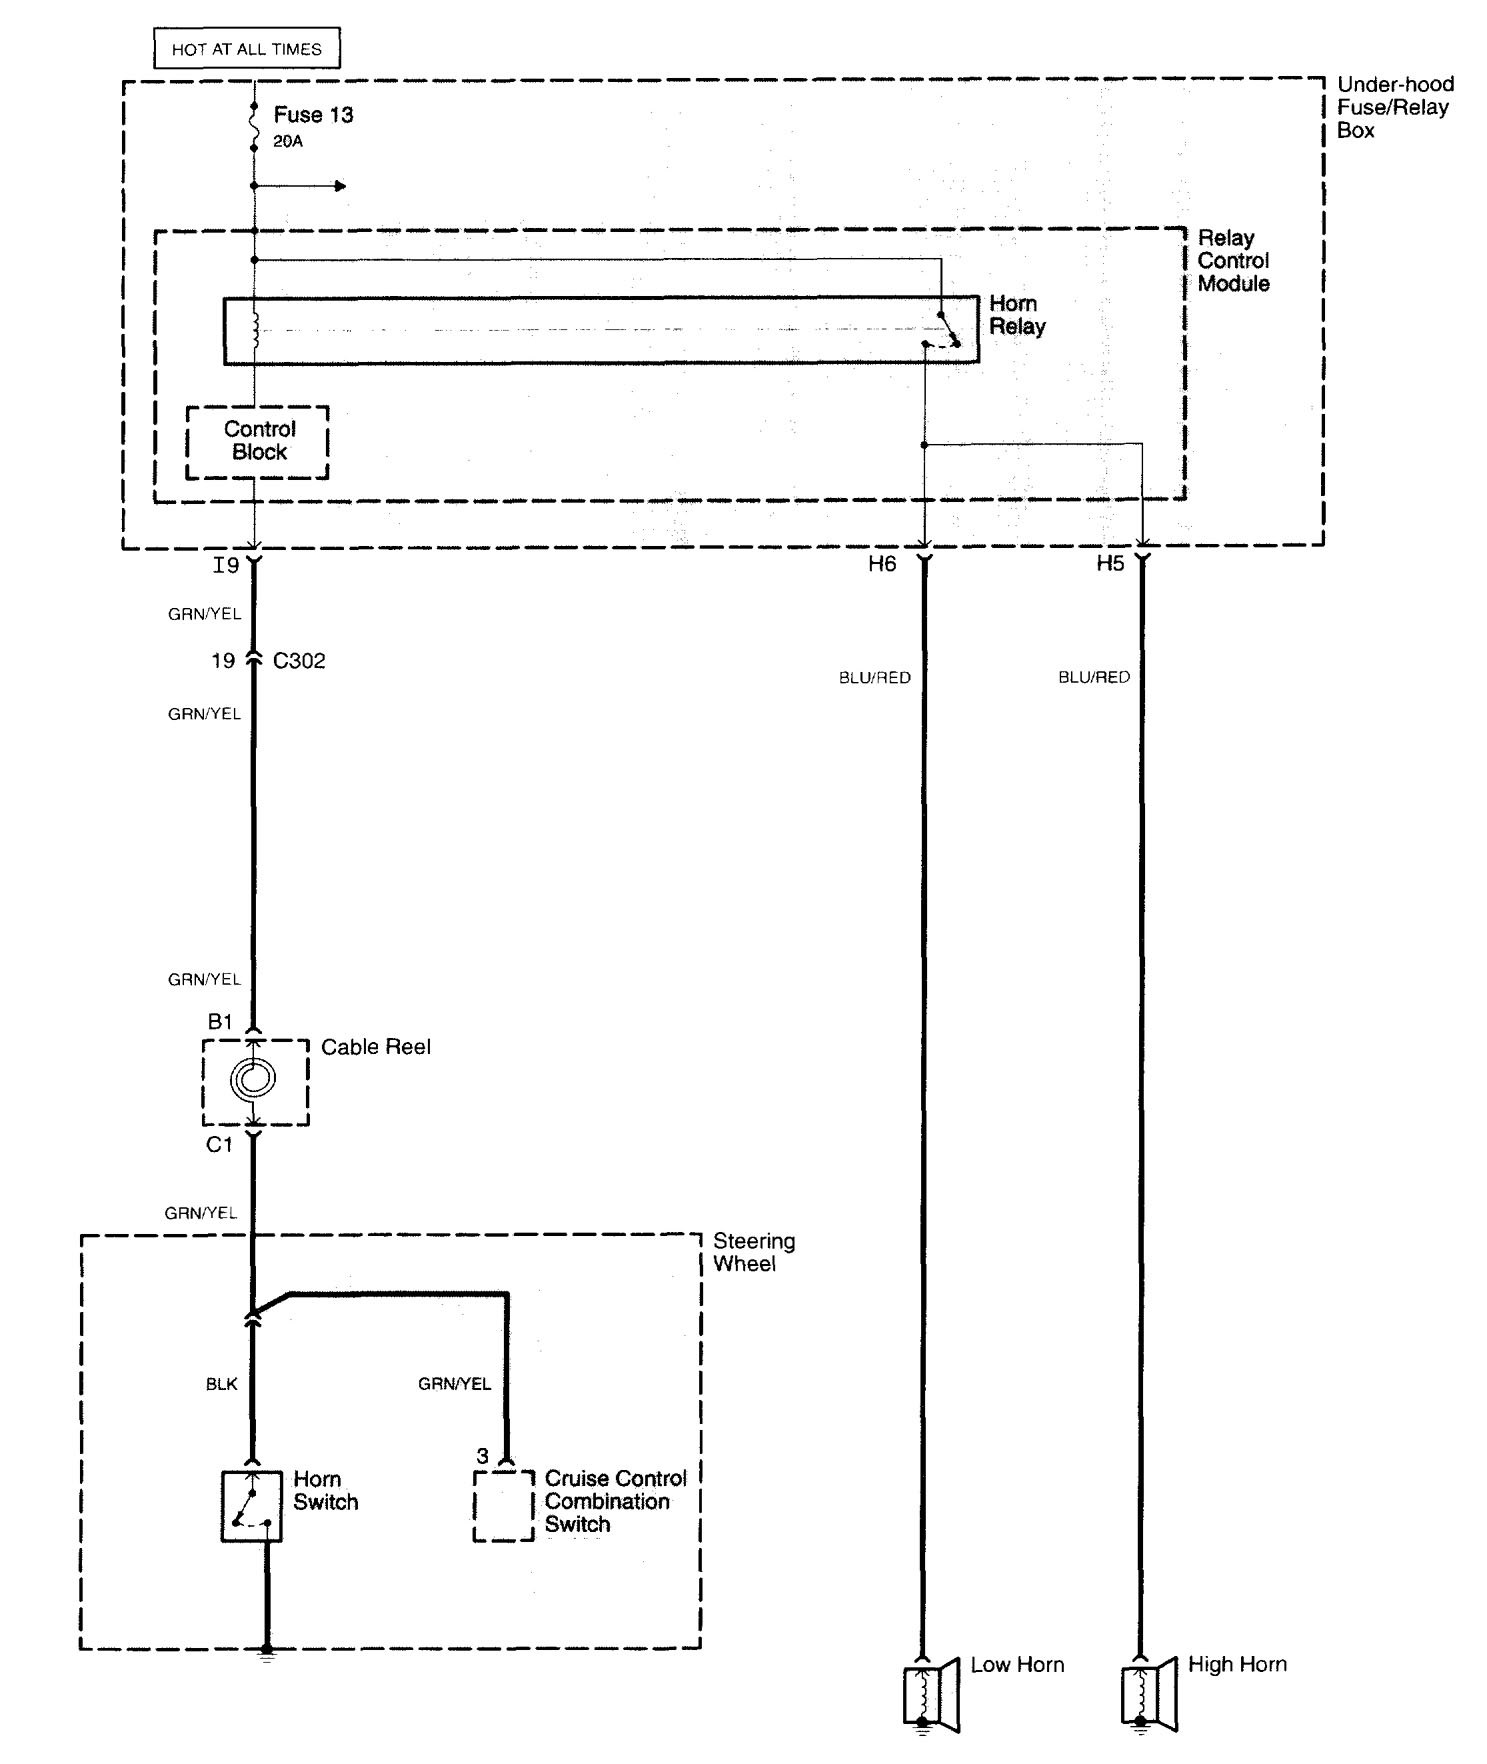 hight resolution of acura tl 2006 wiring diagrams horn carknowledge 2003 dodge grand caravan wiring diagram horn wiring diagram 2003 gmc sierra 2500hd